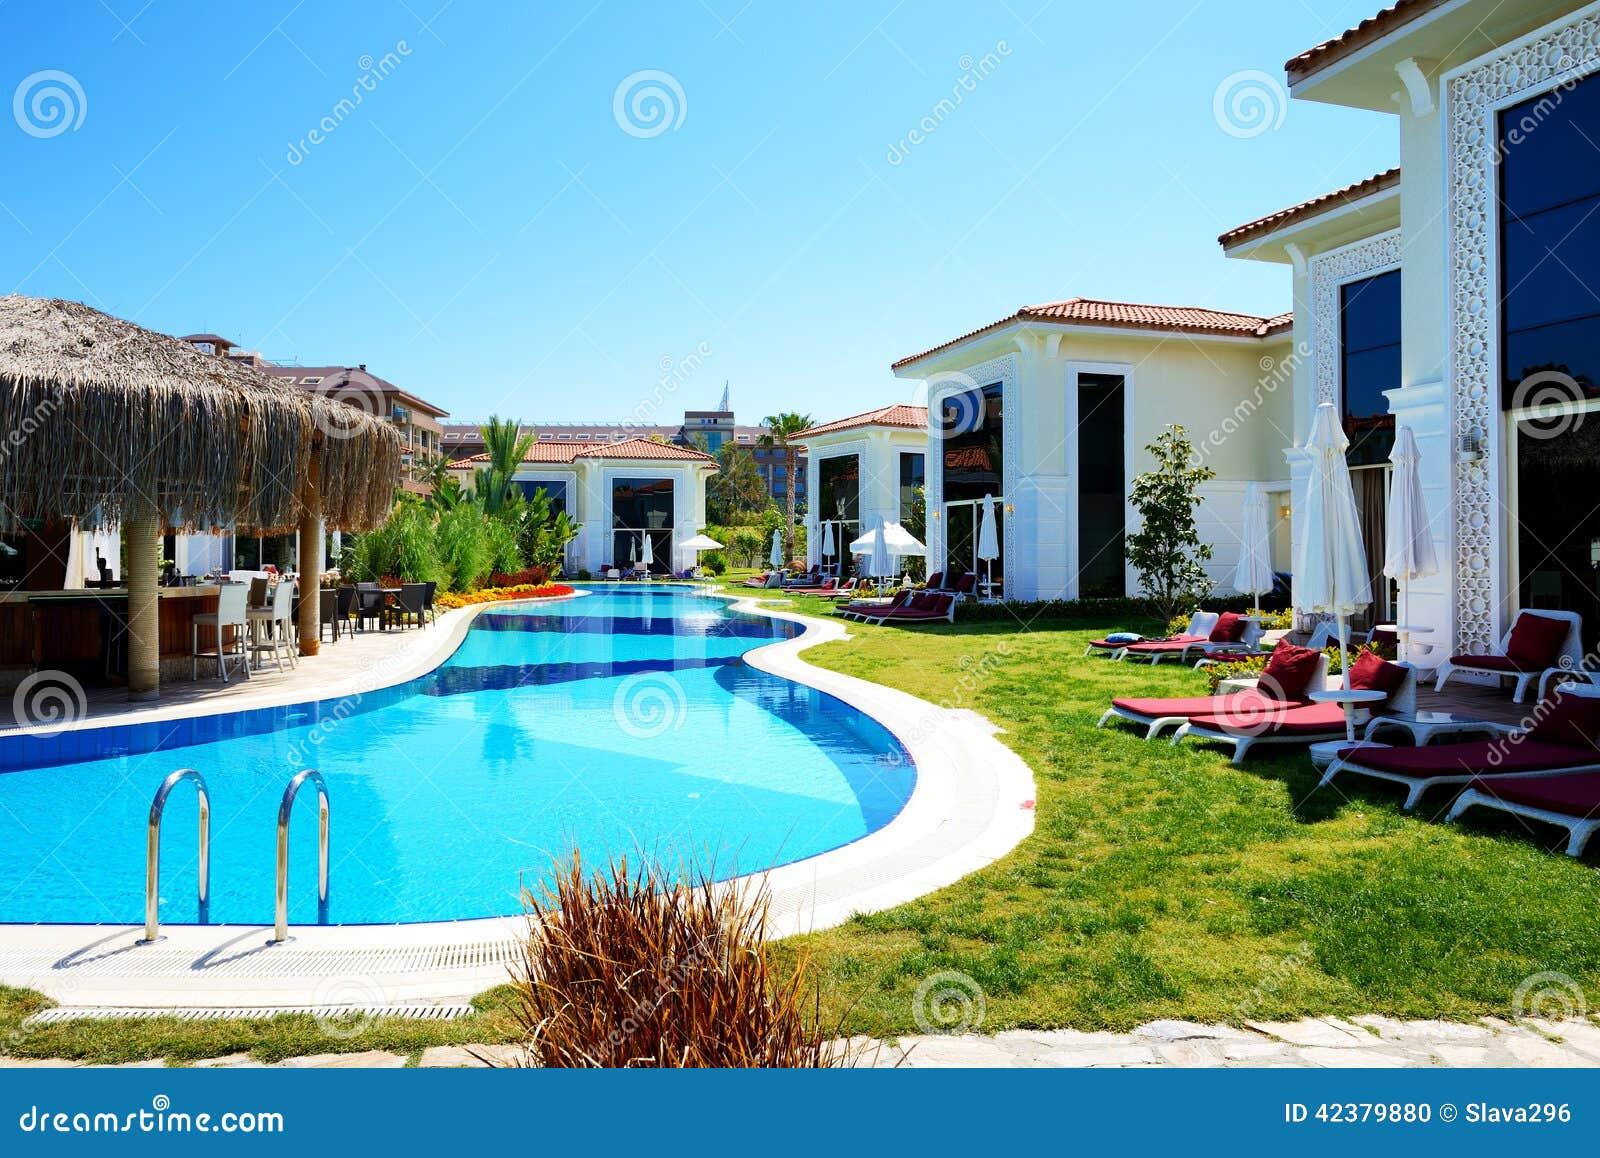 Casas de campo modernas com piscina no hotel de luxo foto for Fotos de casas de campo con piscina